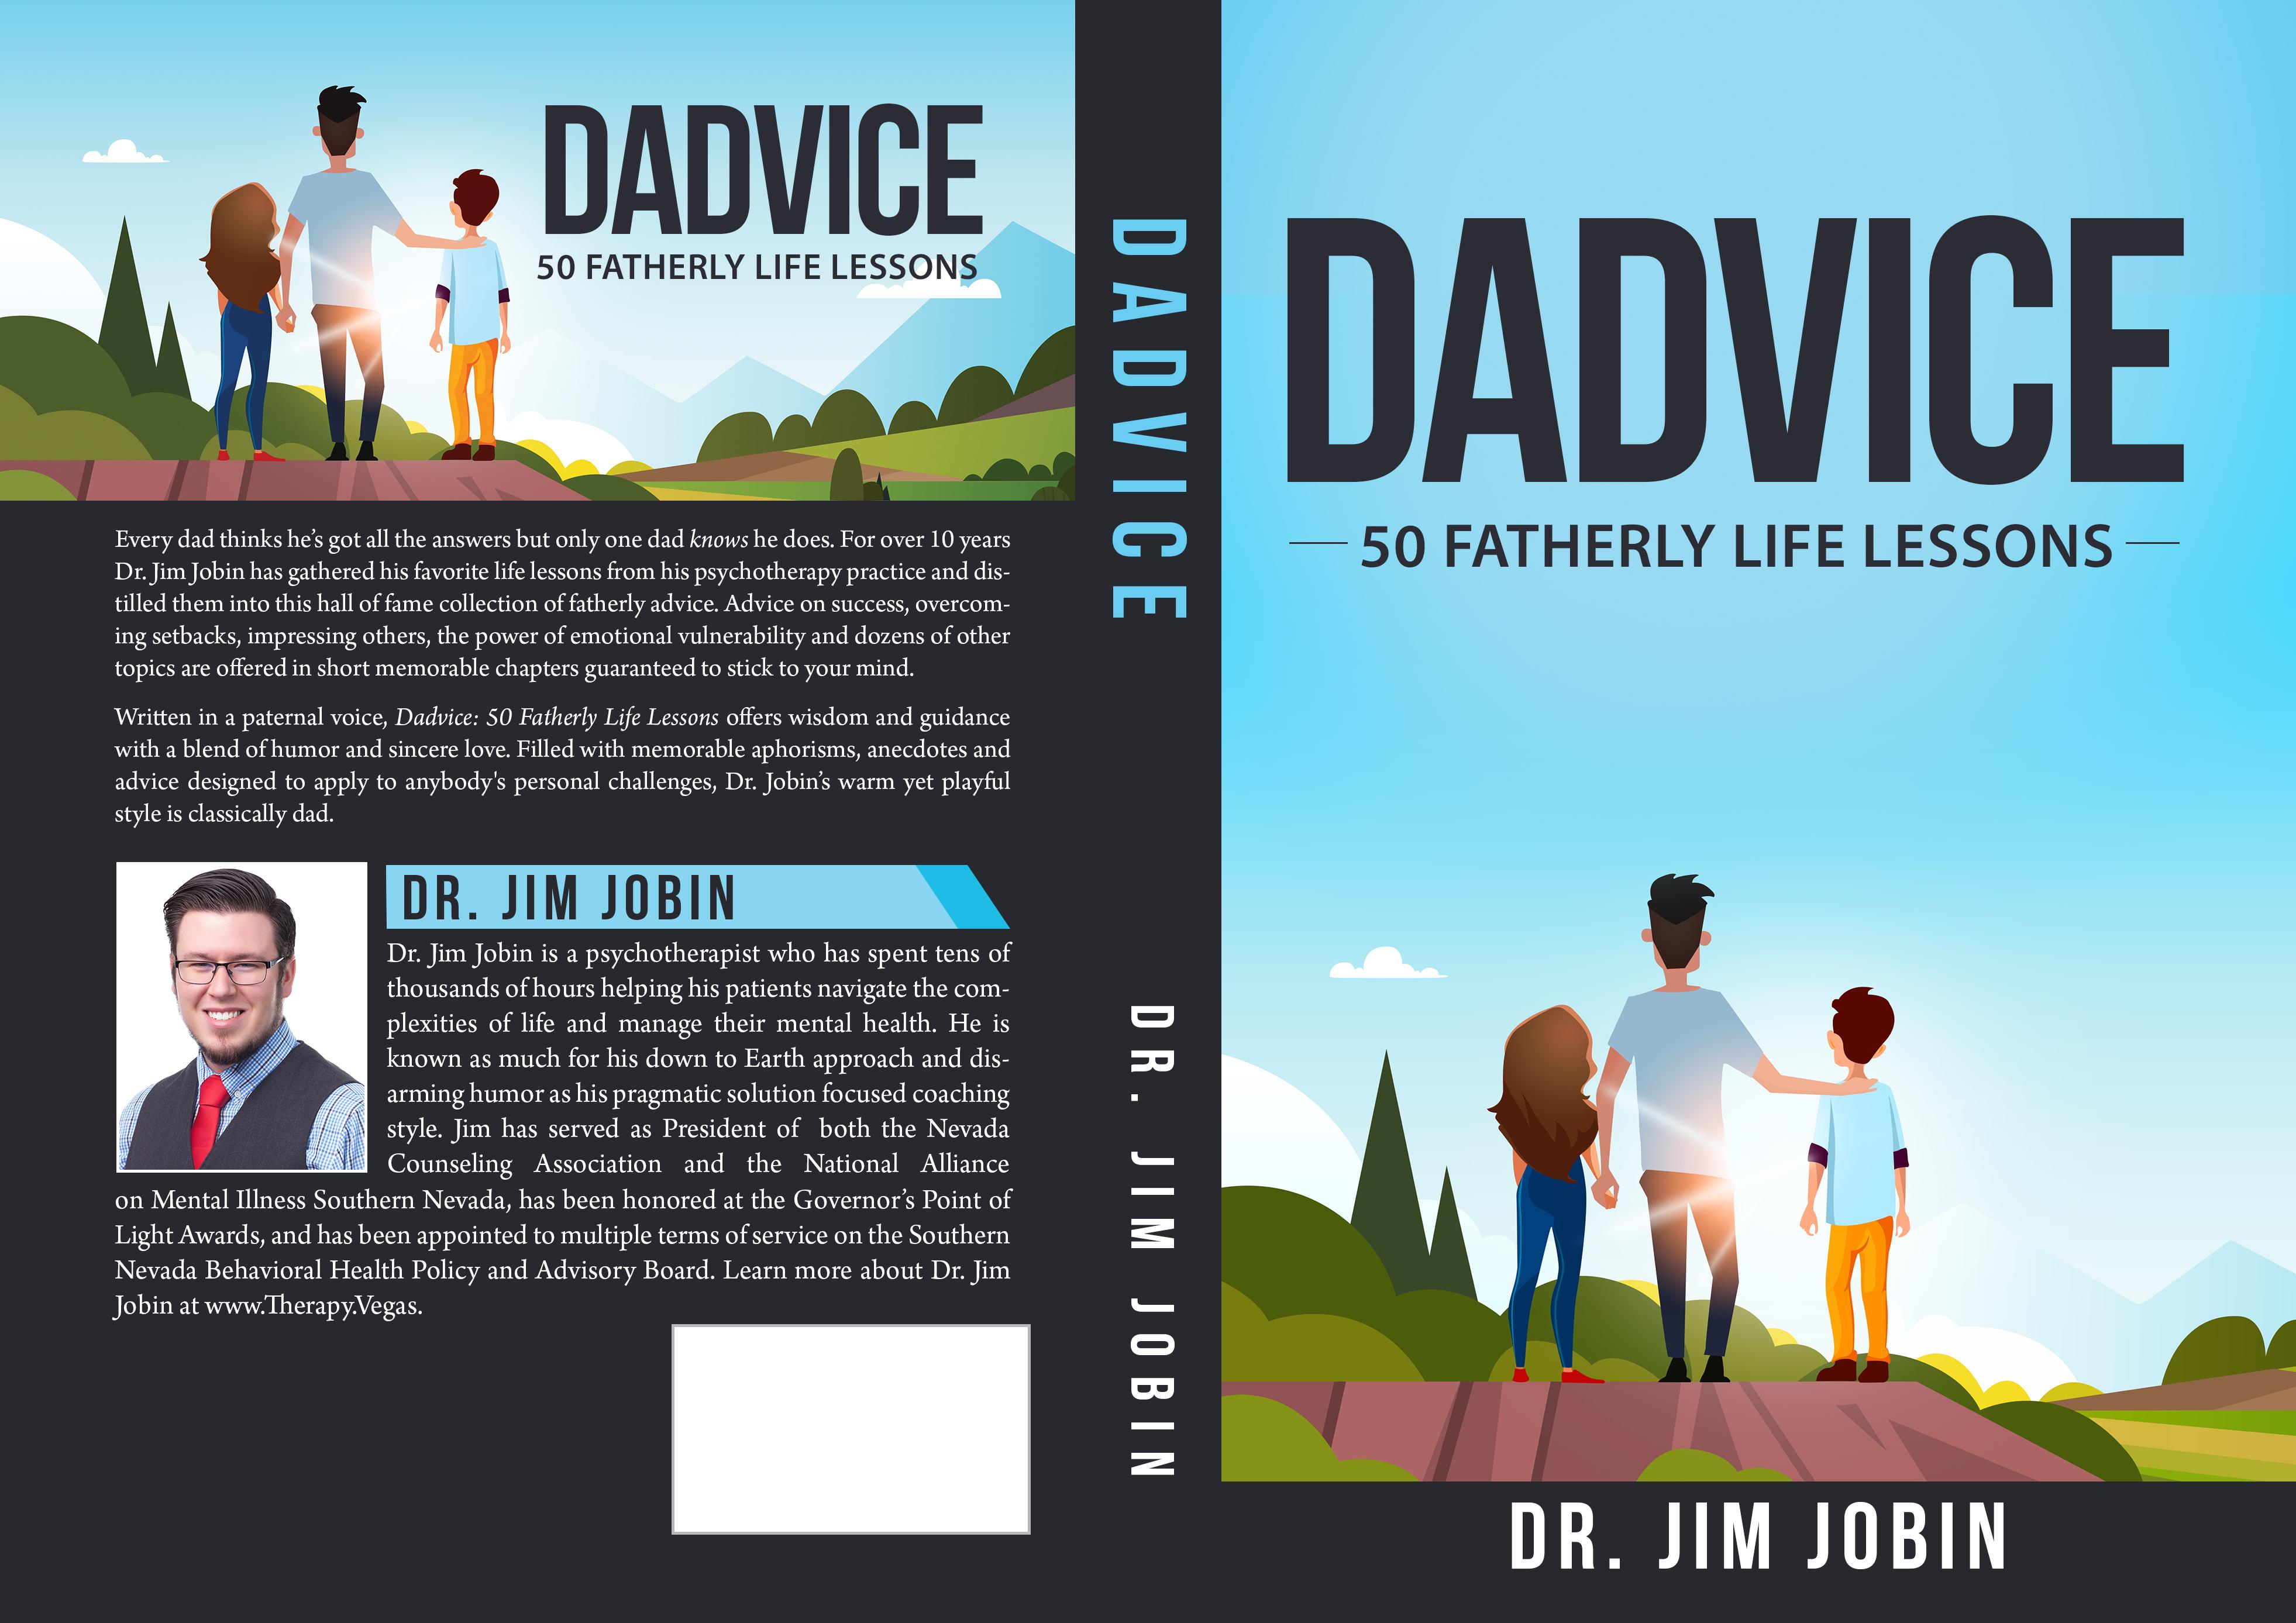 Book on Fatherly Advice